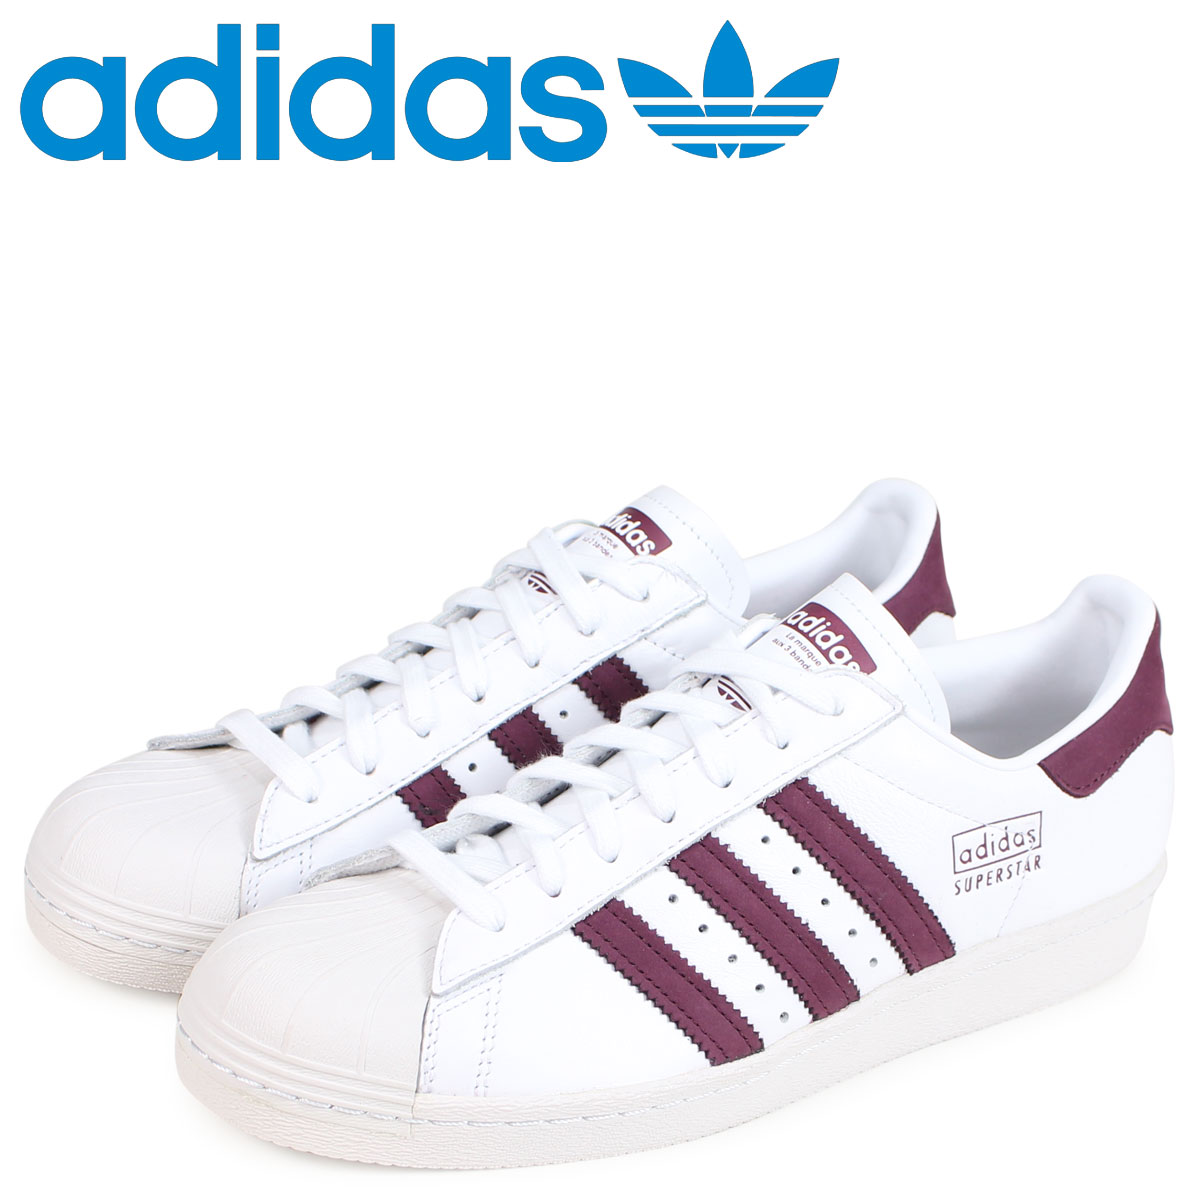 adidas superstar 80s singapore